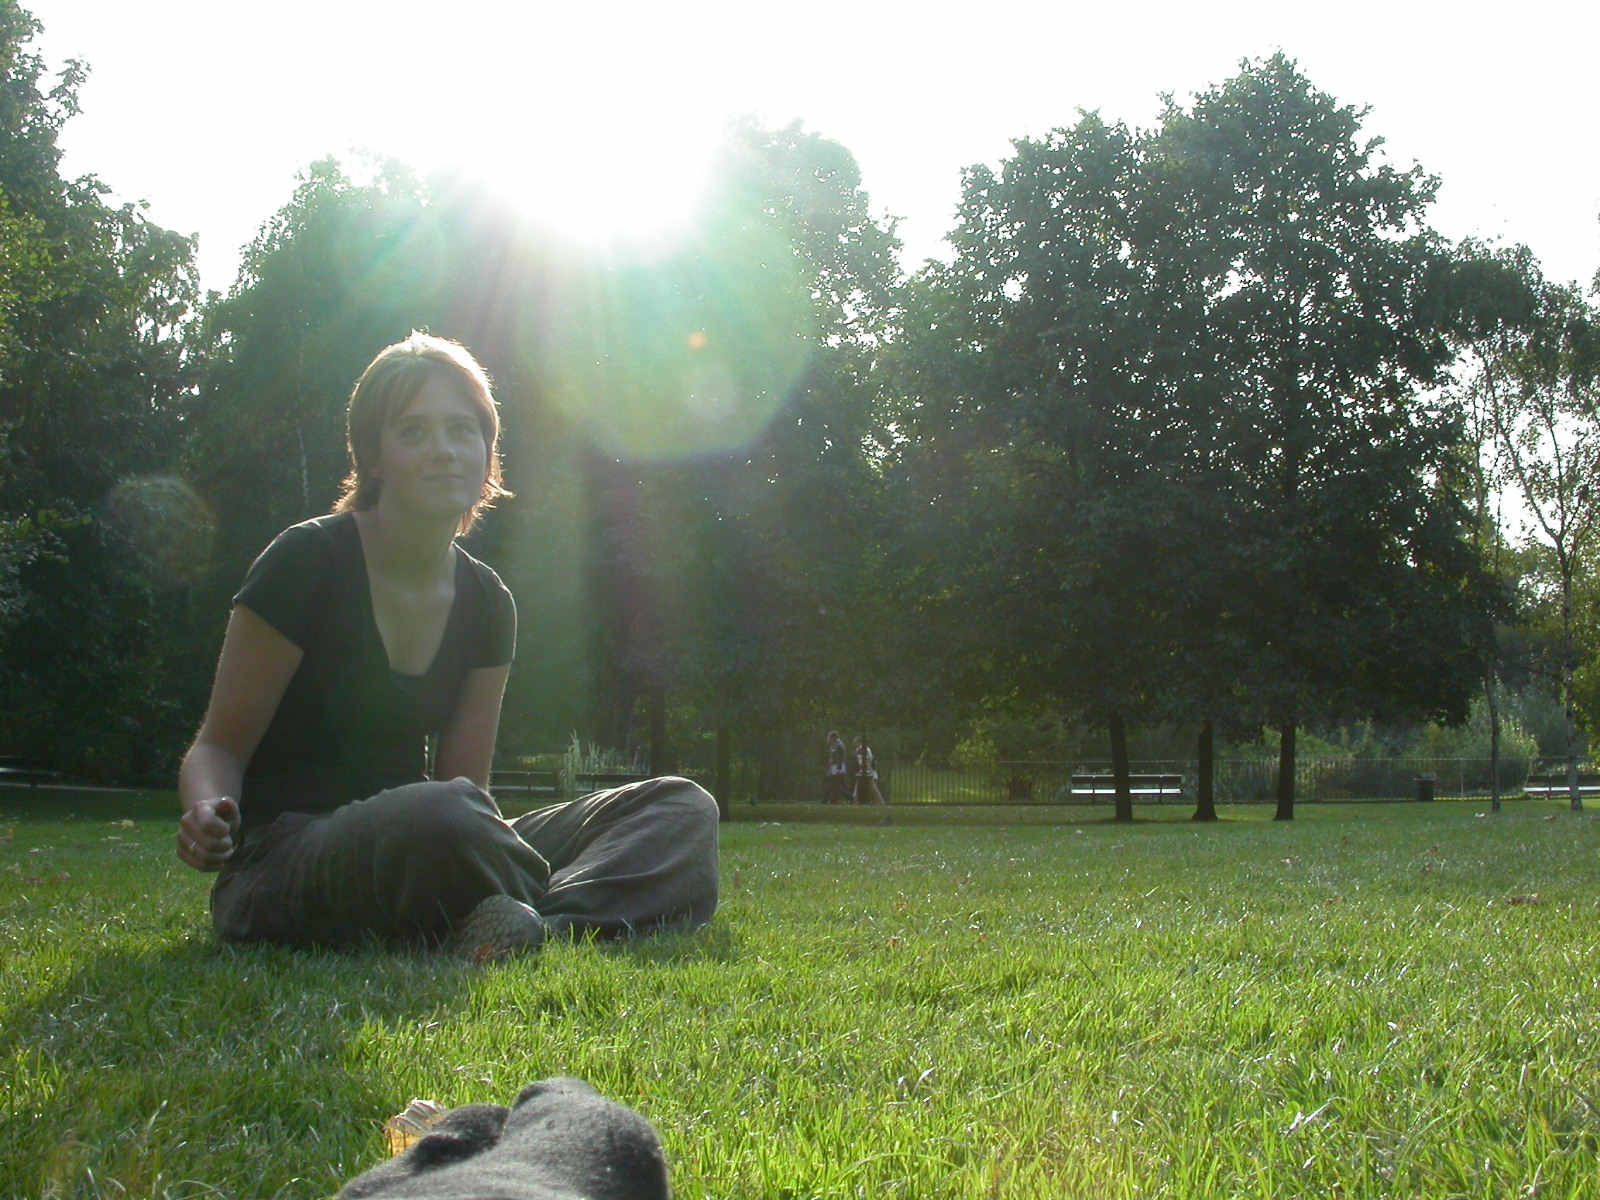 eva park sitting warm summer summer's day grass girl outdoors bright sunshine